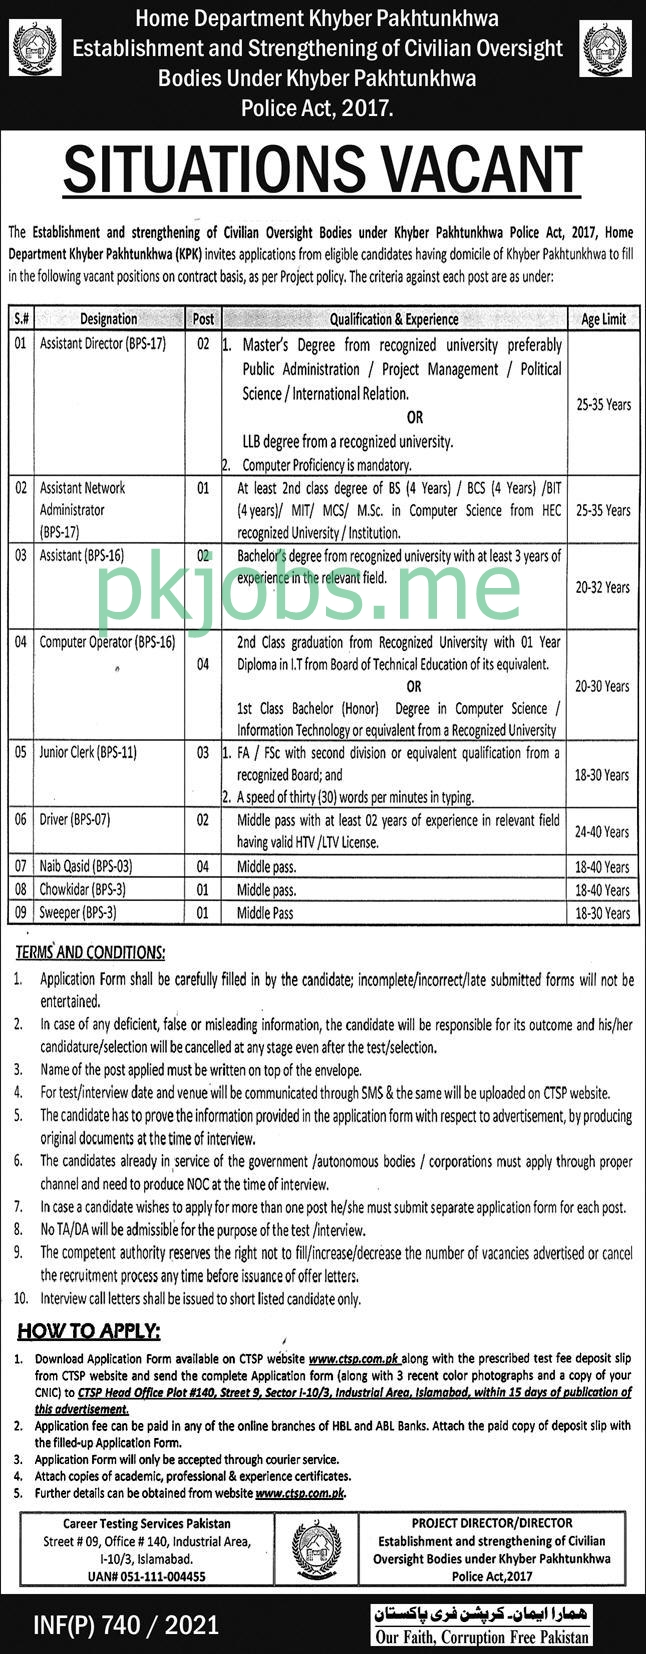 Latest Home Department KPK Posts 2021